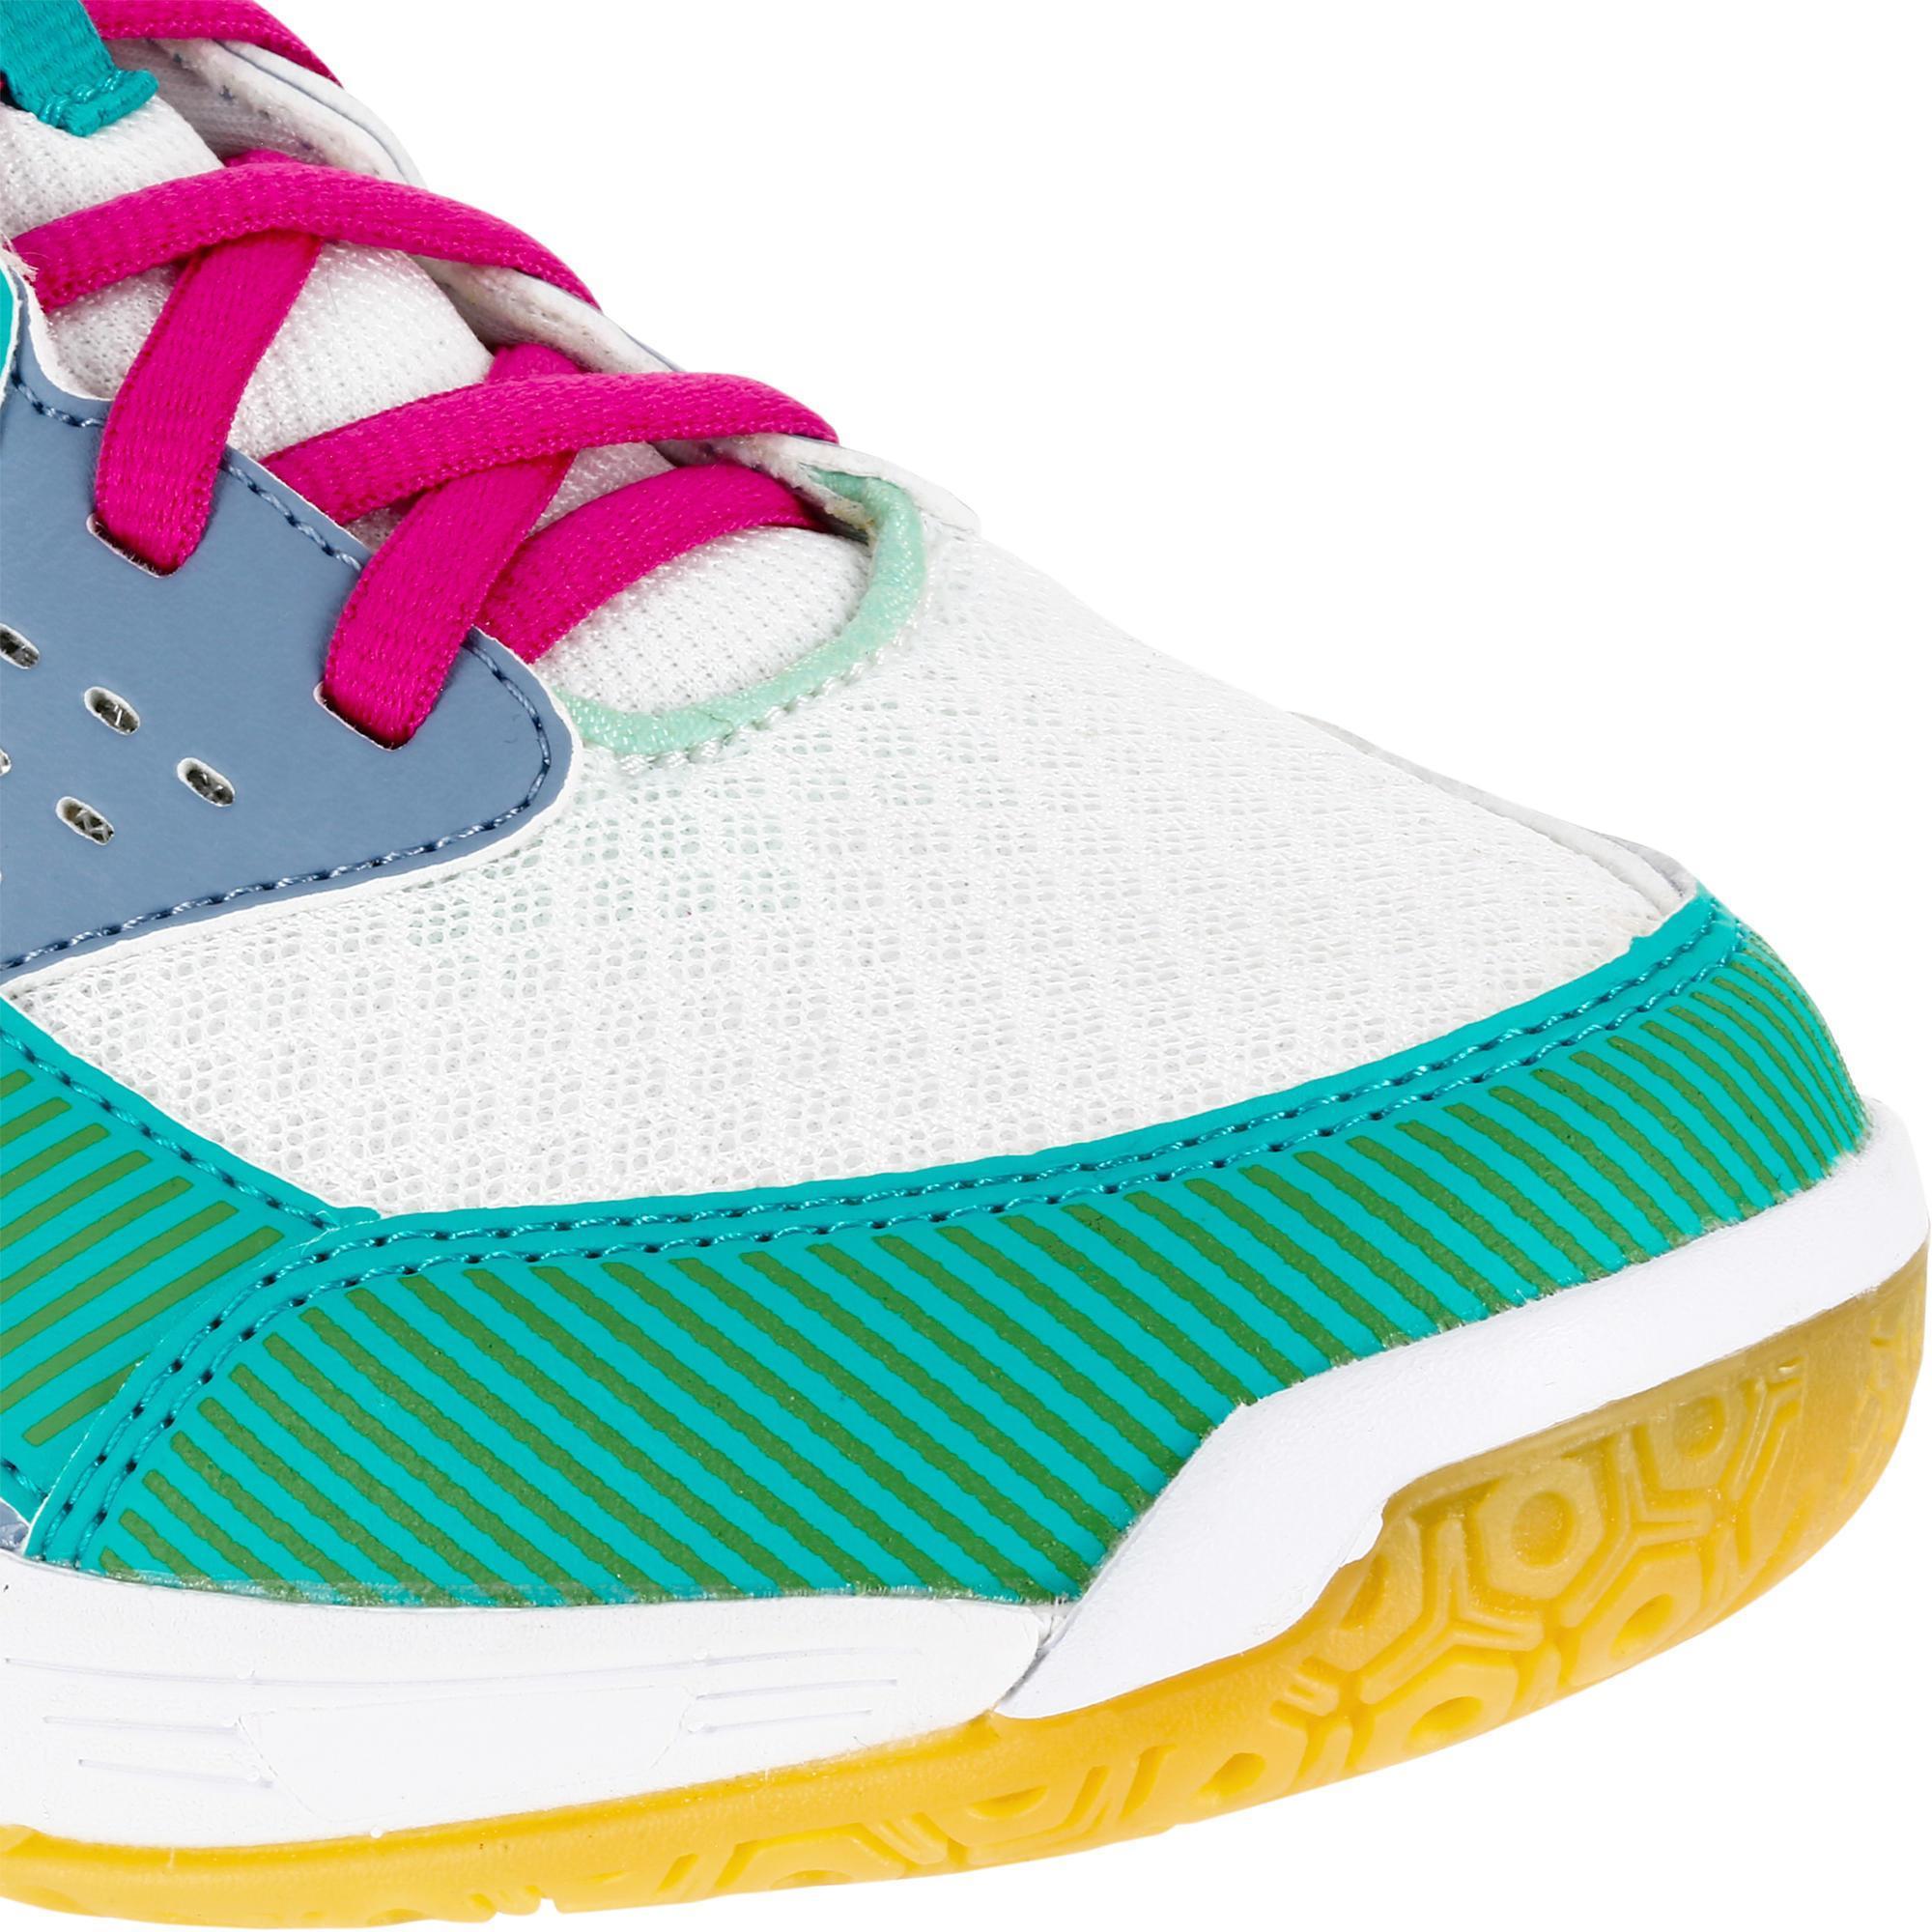 vertes ball V100 de Chaussures volley Decathlon et bleues femme Kipsta  t4w8qpt bcb55322b69f